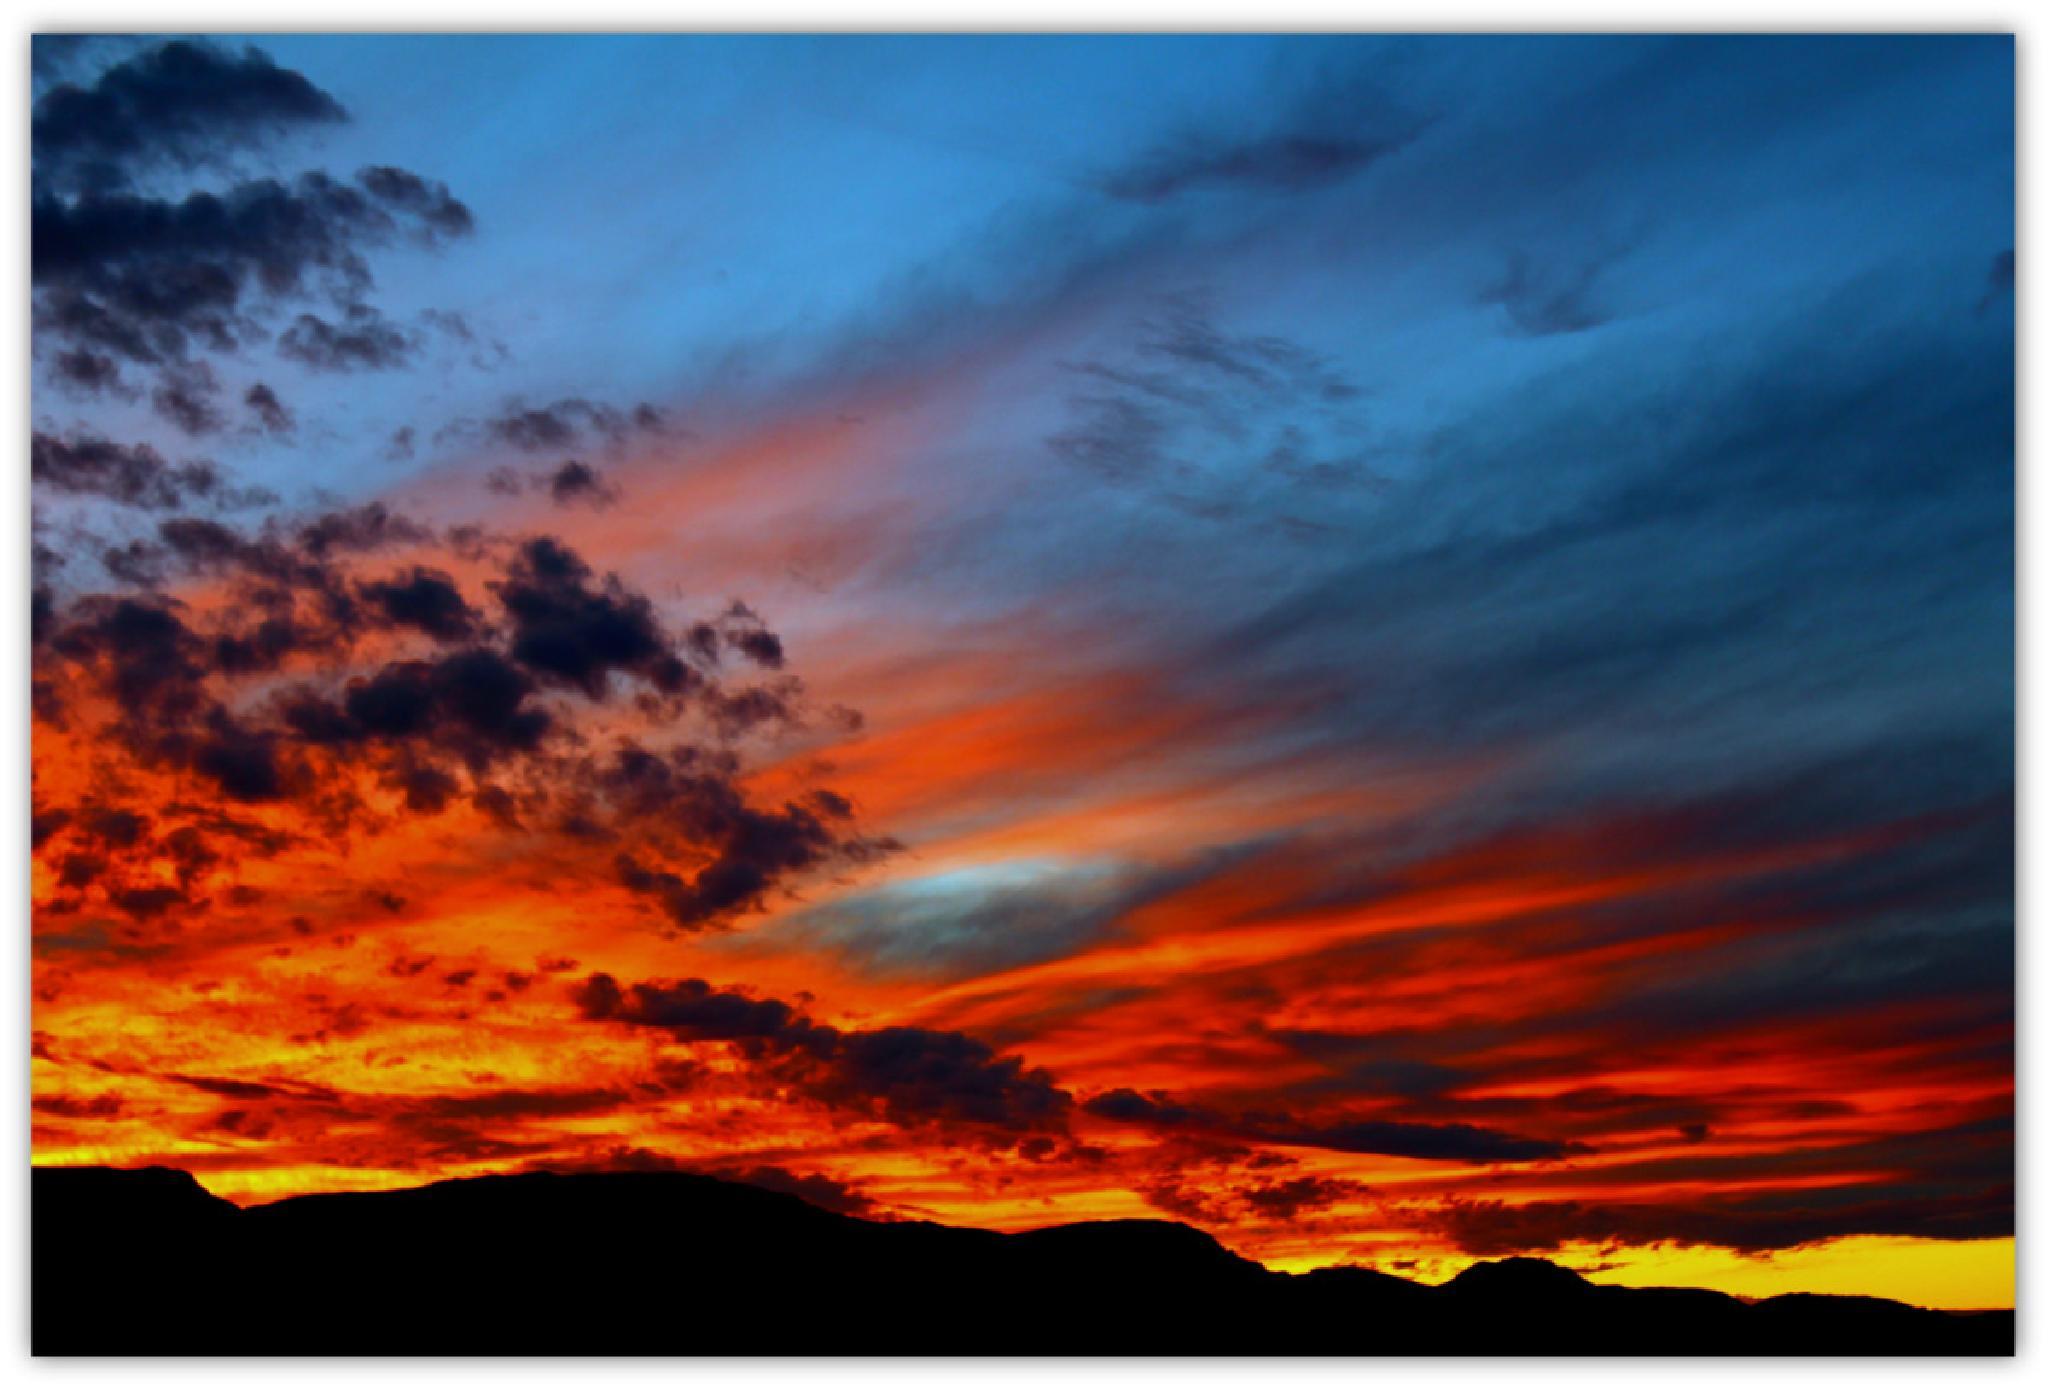 Western Sky by tiffany186